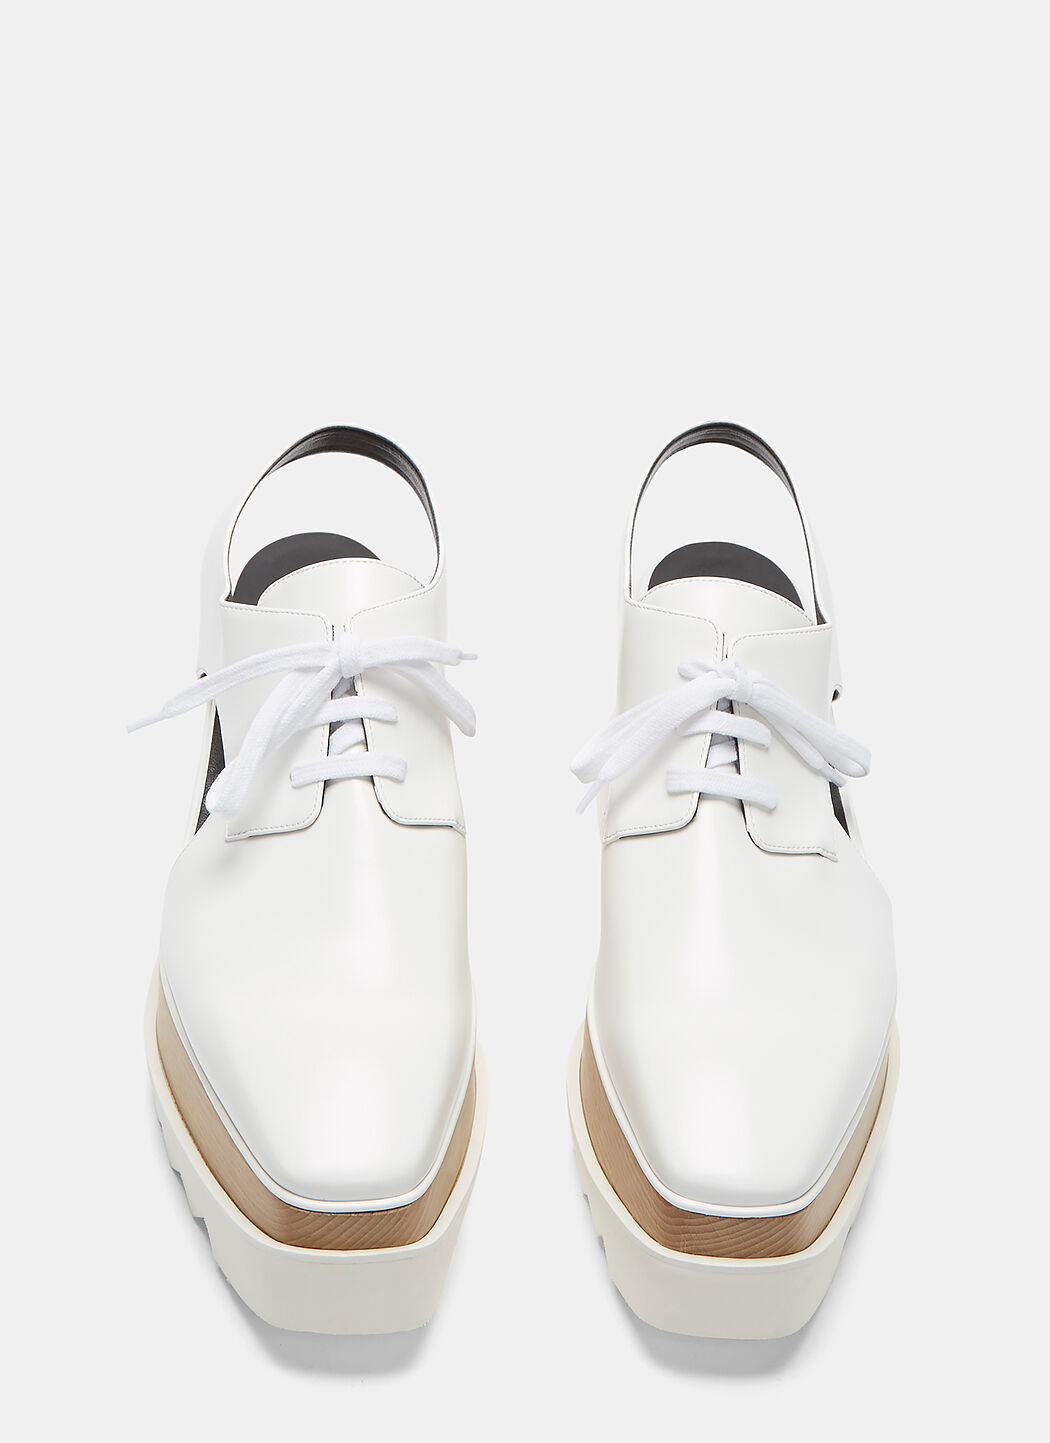 stella mccartney white elyse cut out shoes